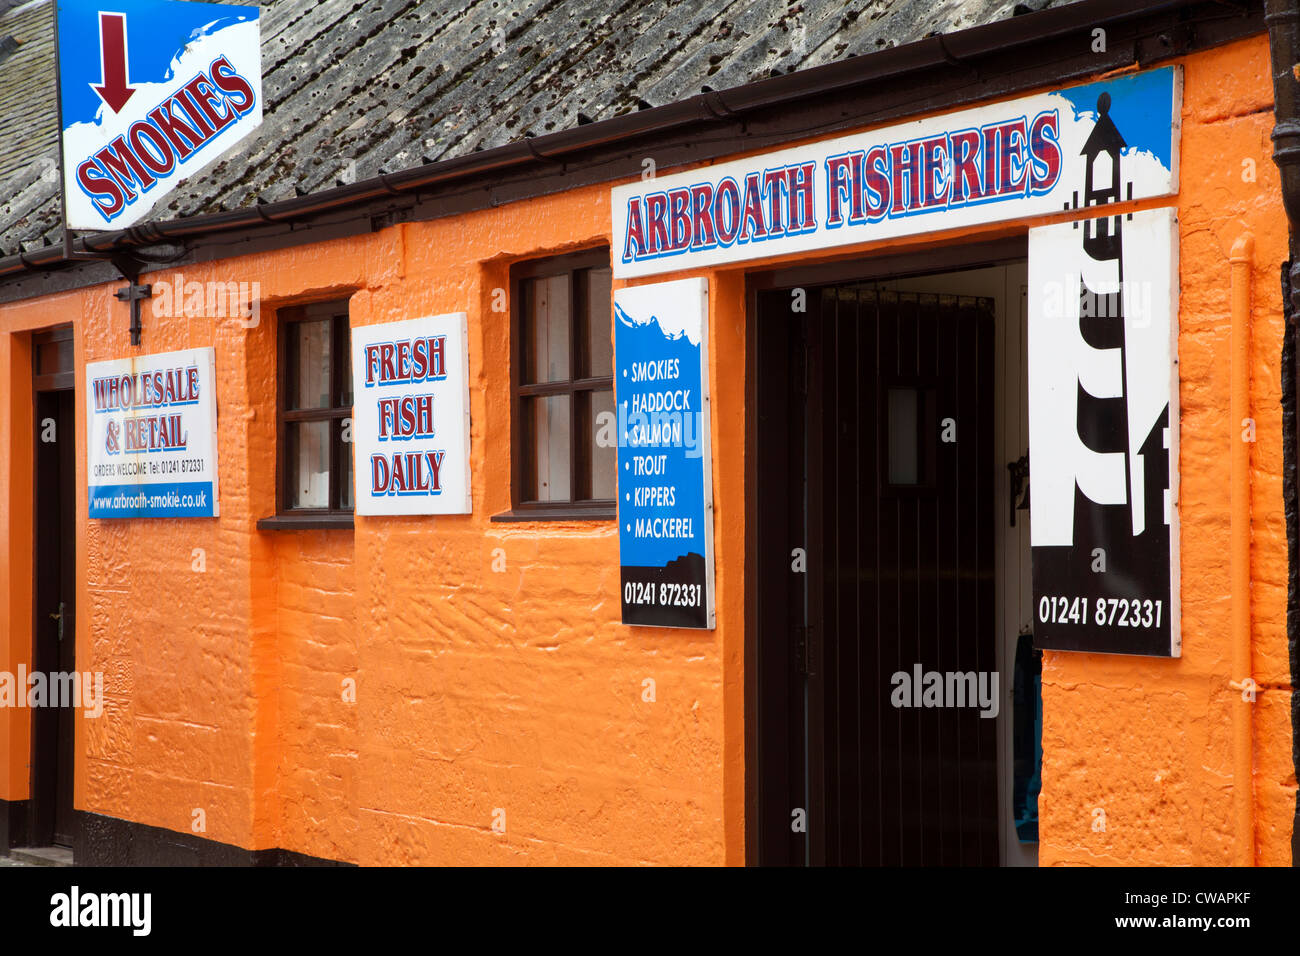 Fish Merchant and Smokehouse in Arbroath Angus Scotland - Stock Image